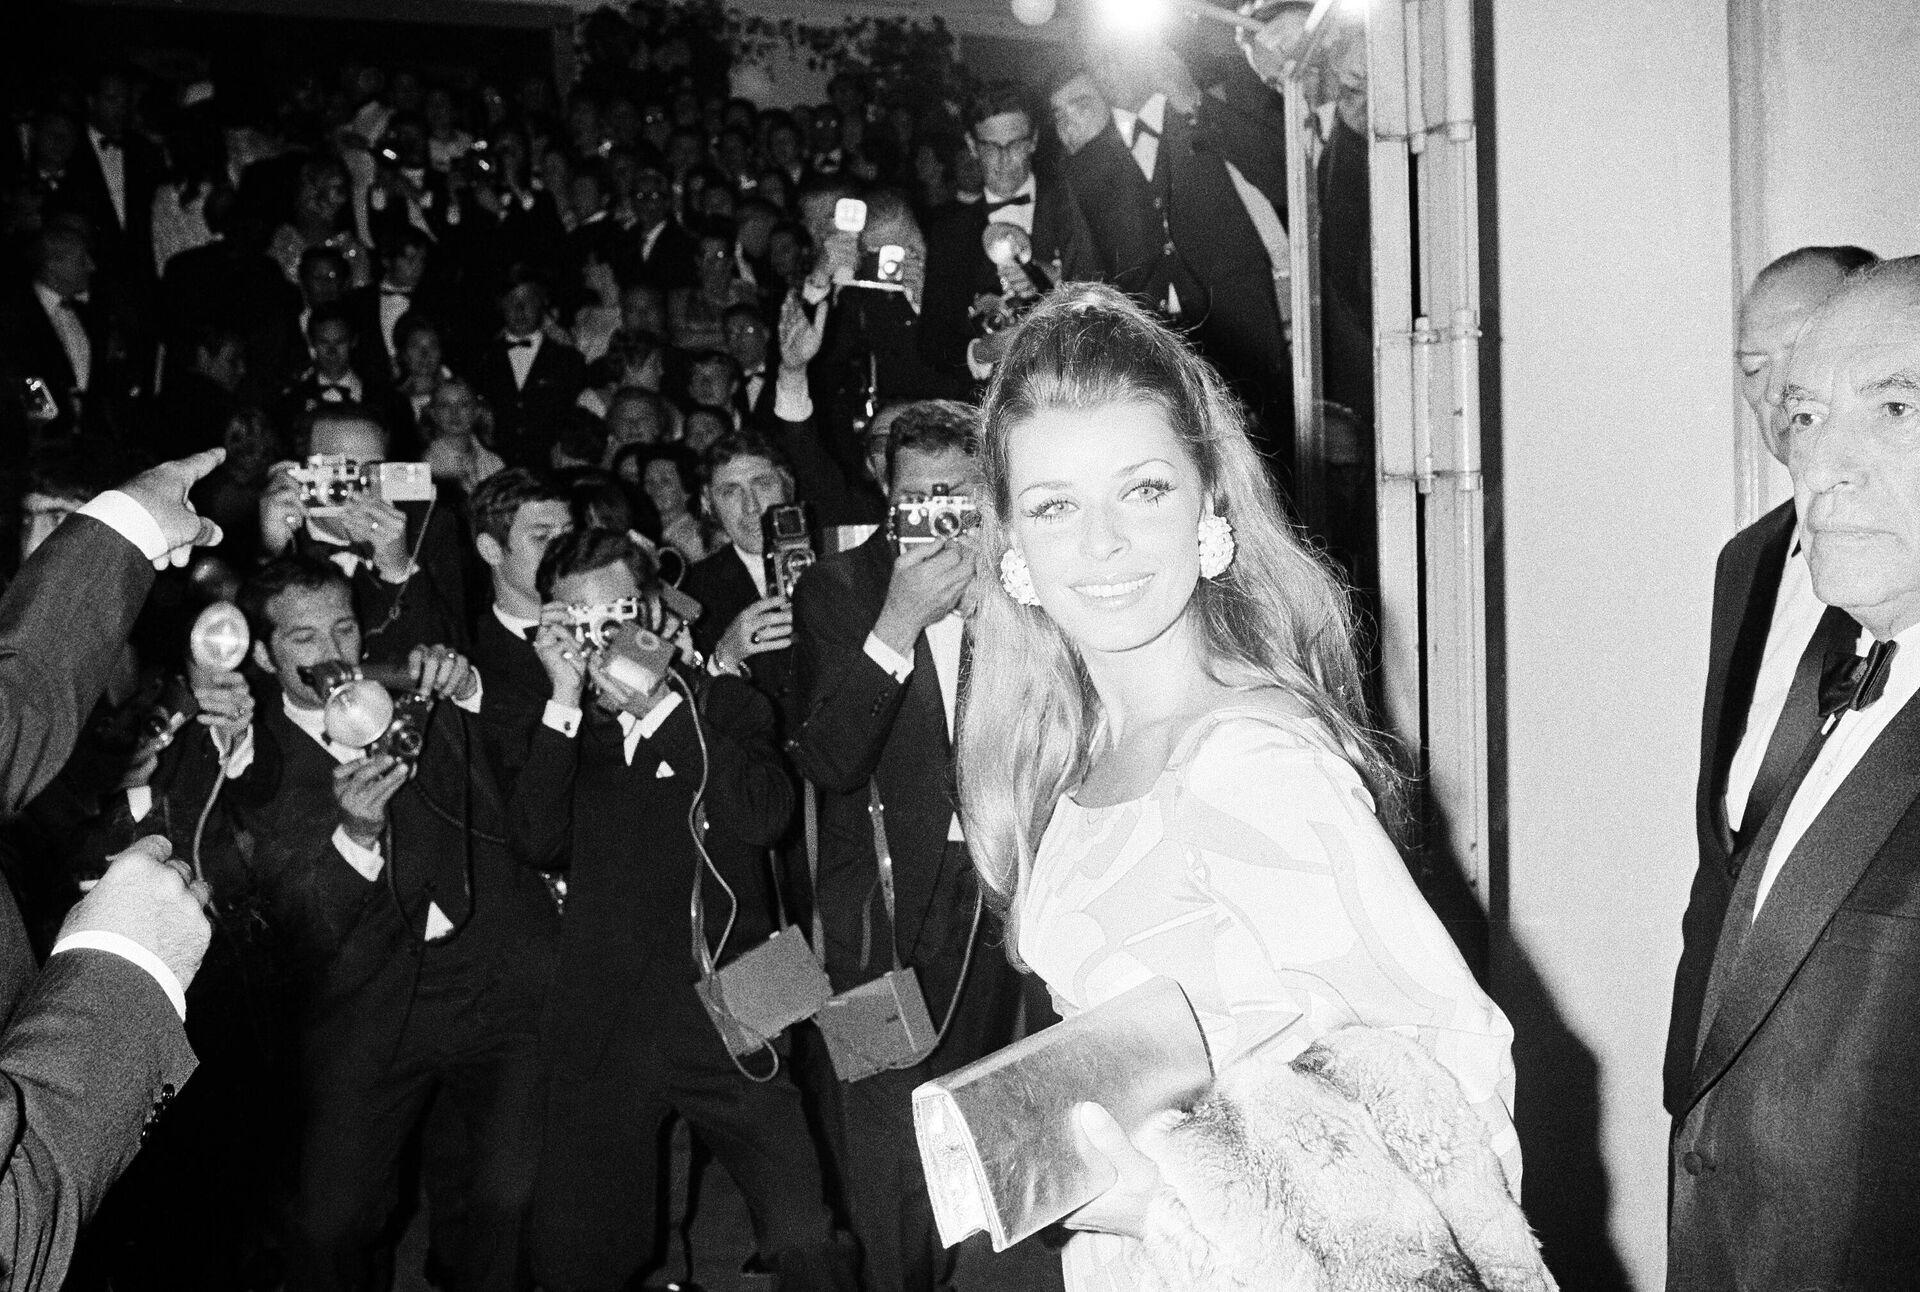 Австрийская актриса Сента Бергер на кинофестивале в Каннах 23 мая 1968  - РИА Новости, 1920, 26.10.2020